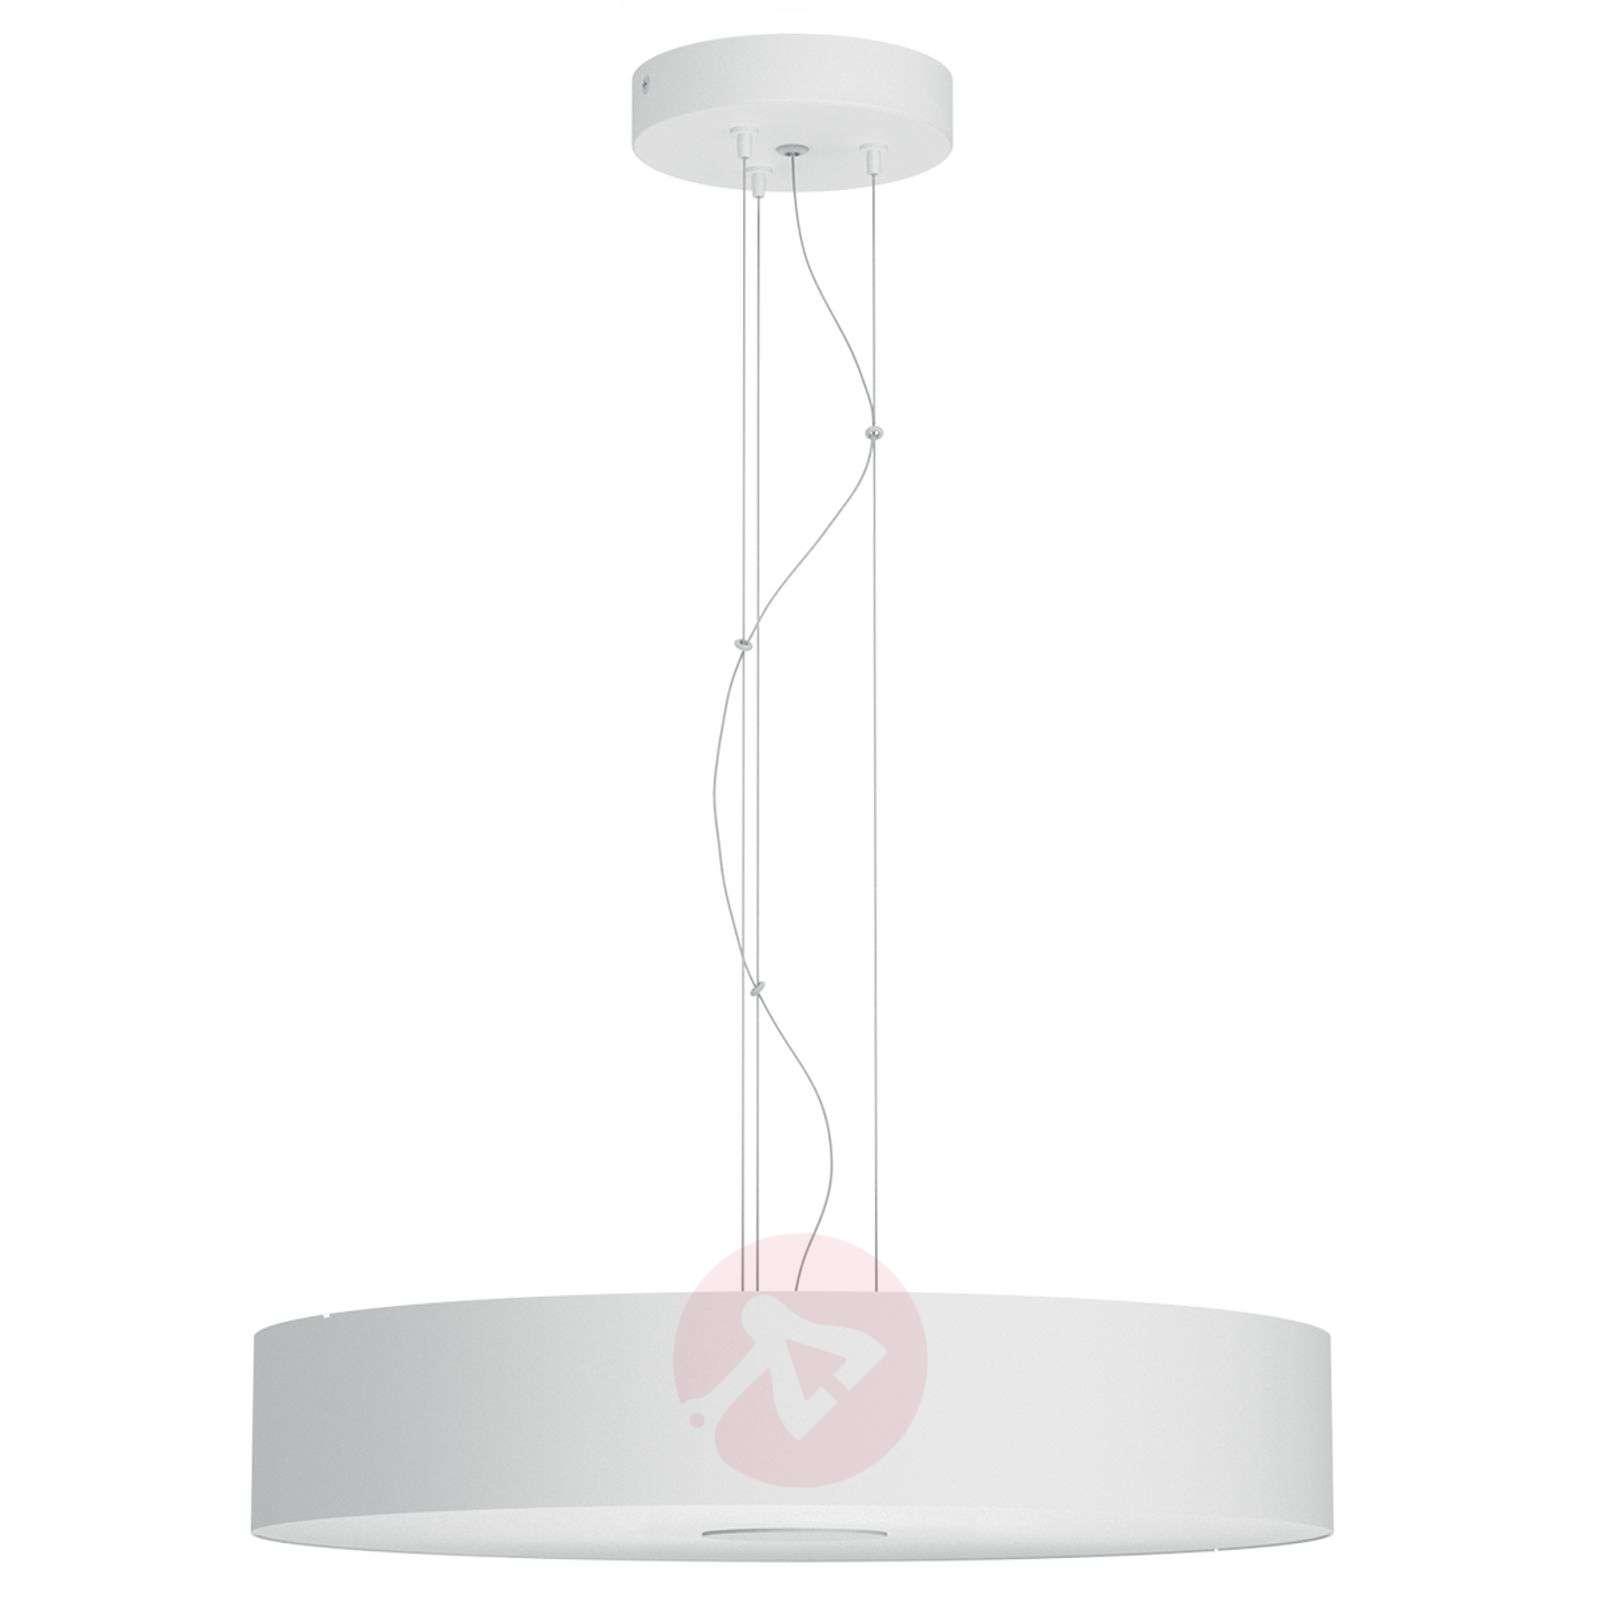 Fair – innovatiivinen Philips Hue-LED-riippuvalo-7531875-01